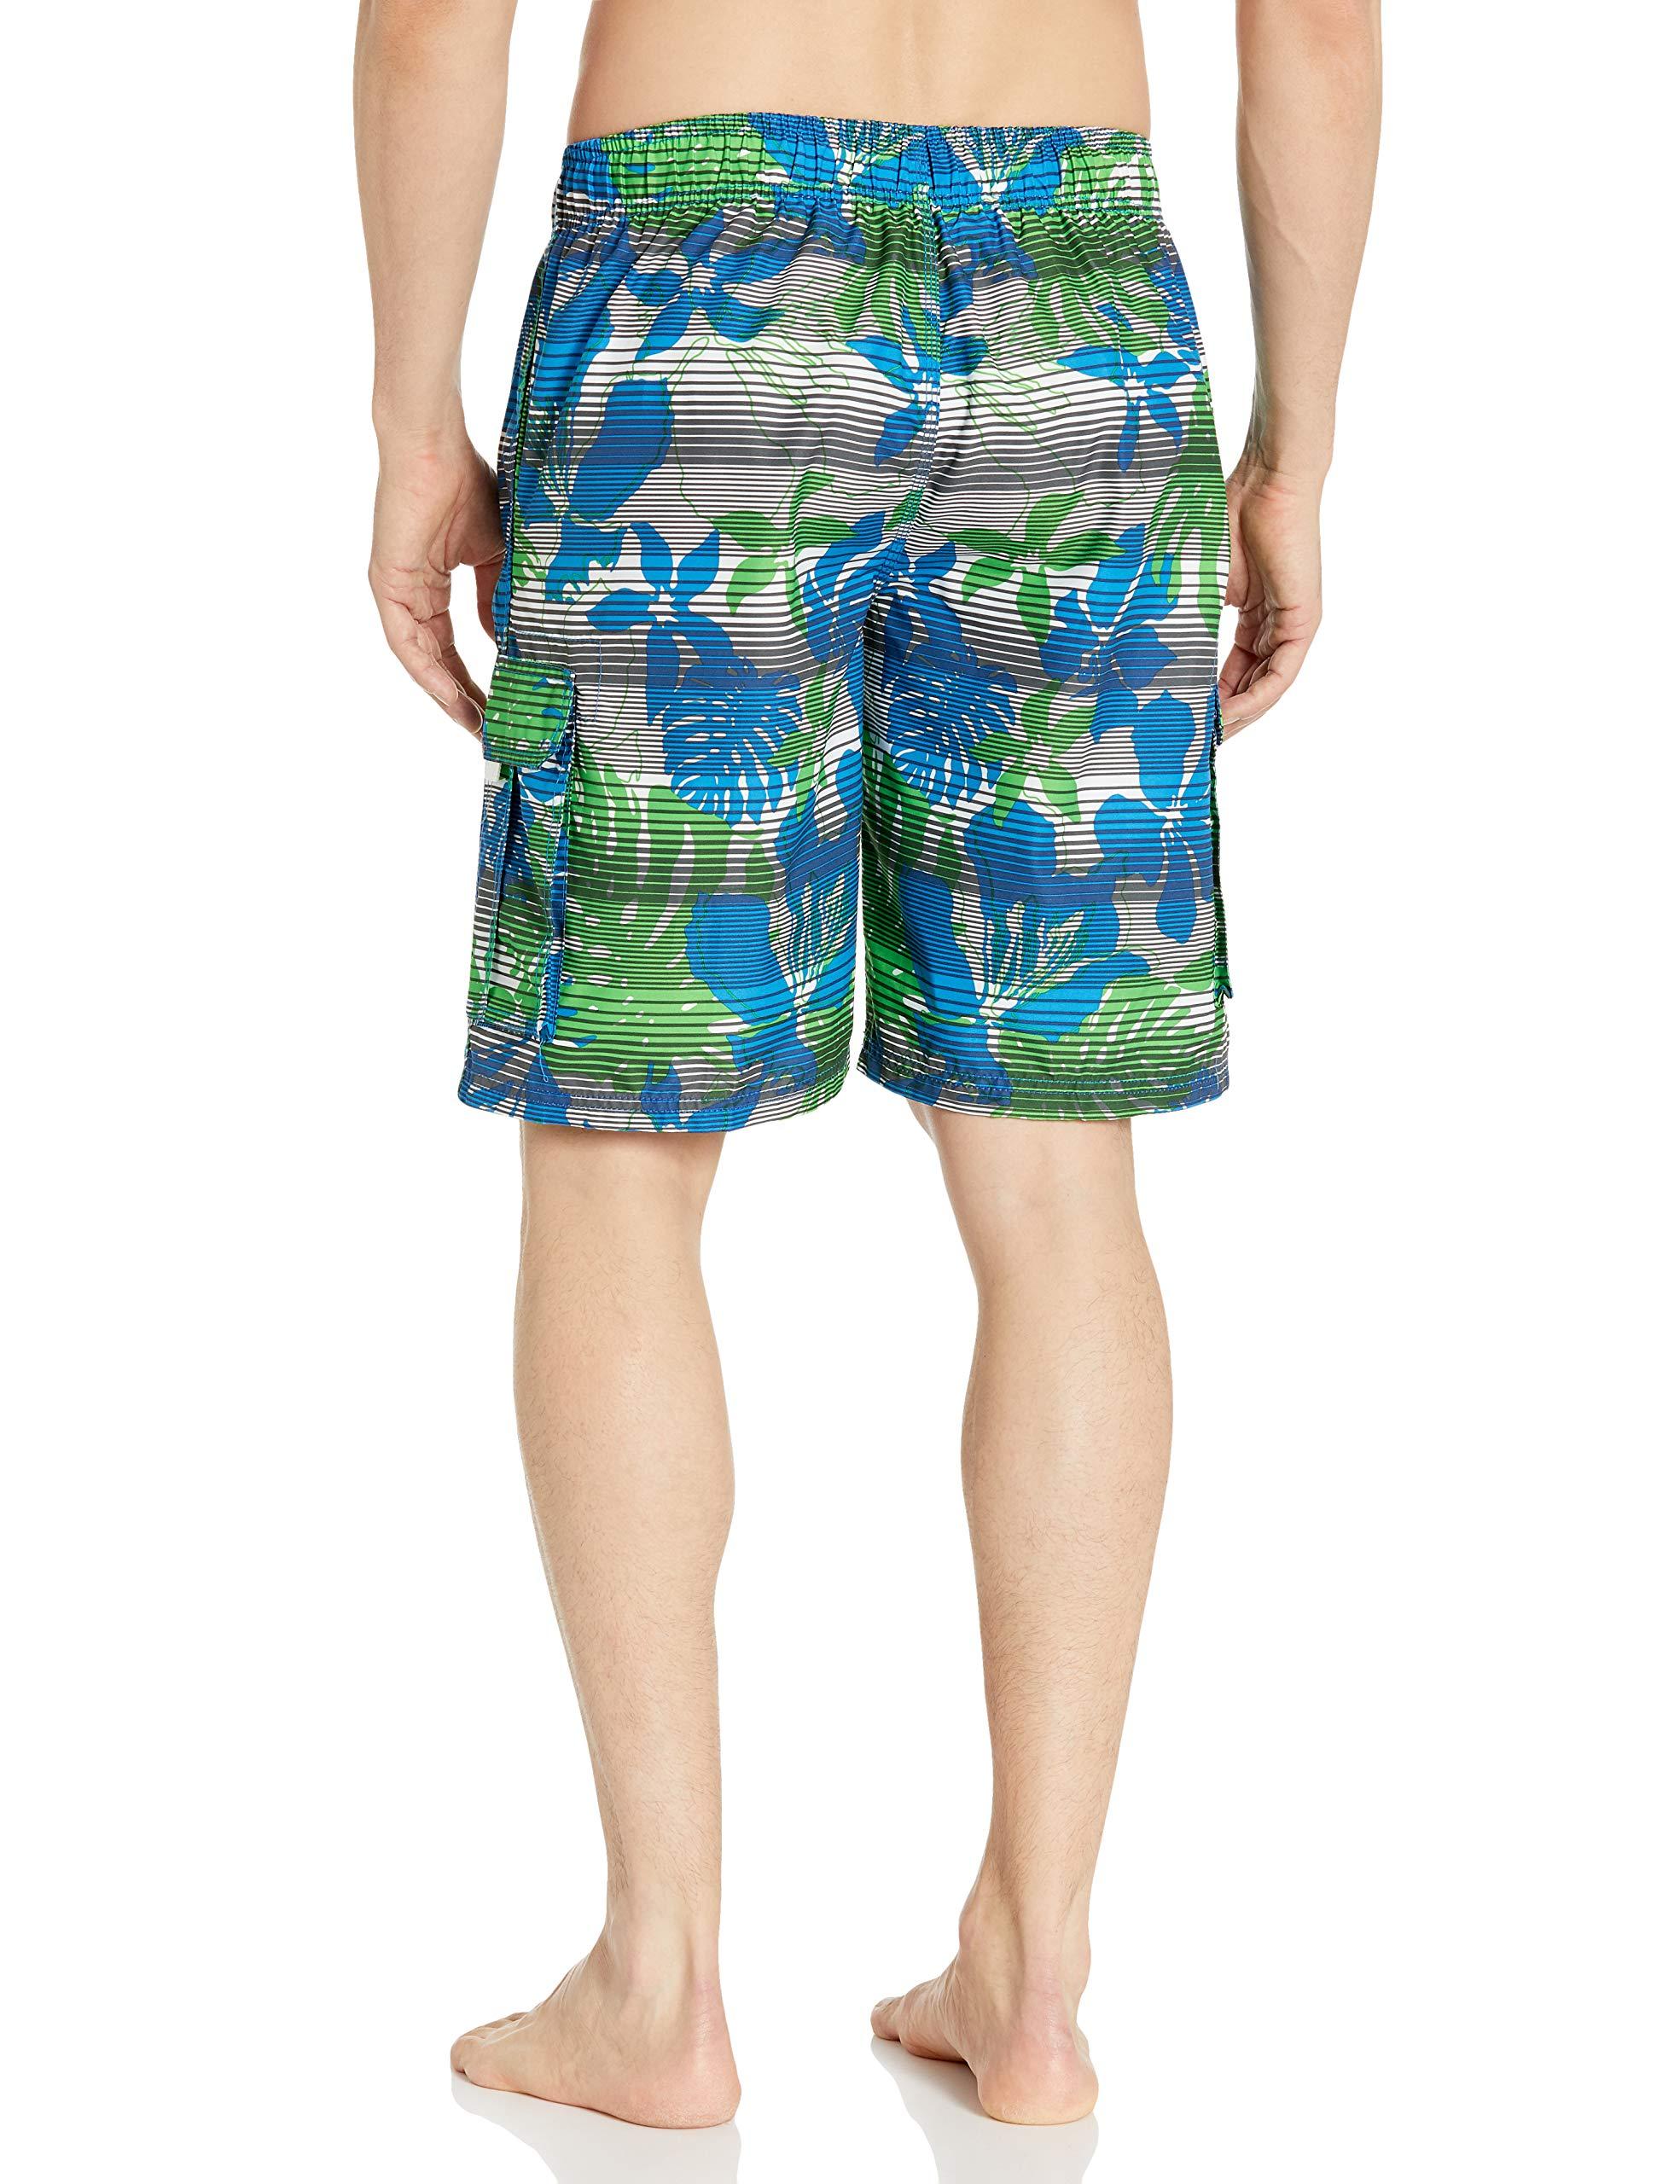 Kanu Surf Men's Barracuda Swim Trunks (Regular & Extended Sizes)